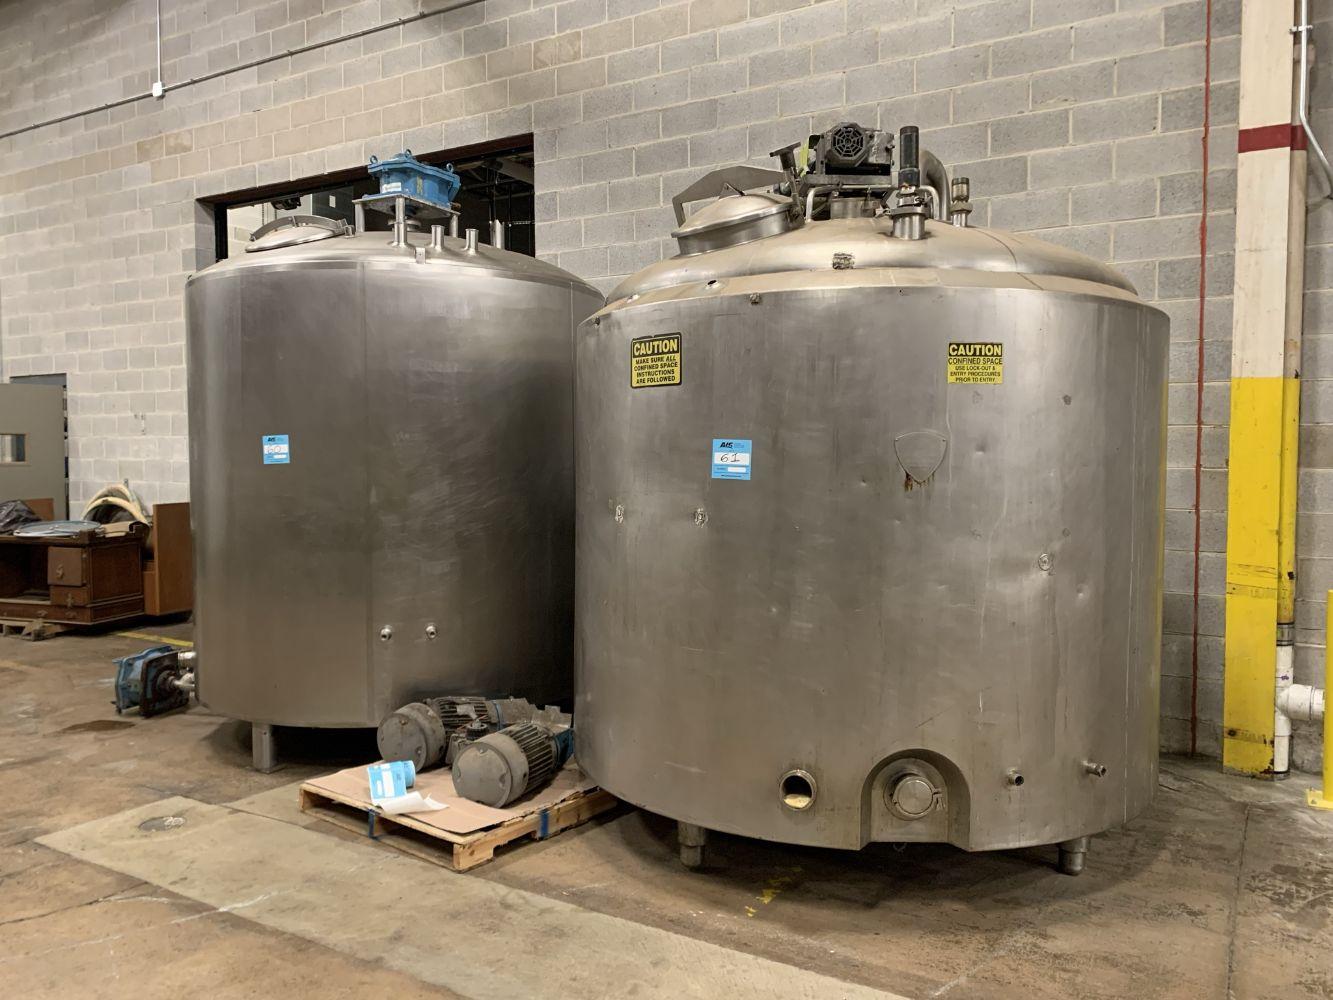 Surplus Food Grade Liquid Packaging & Processing Equipment